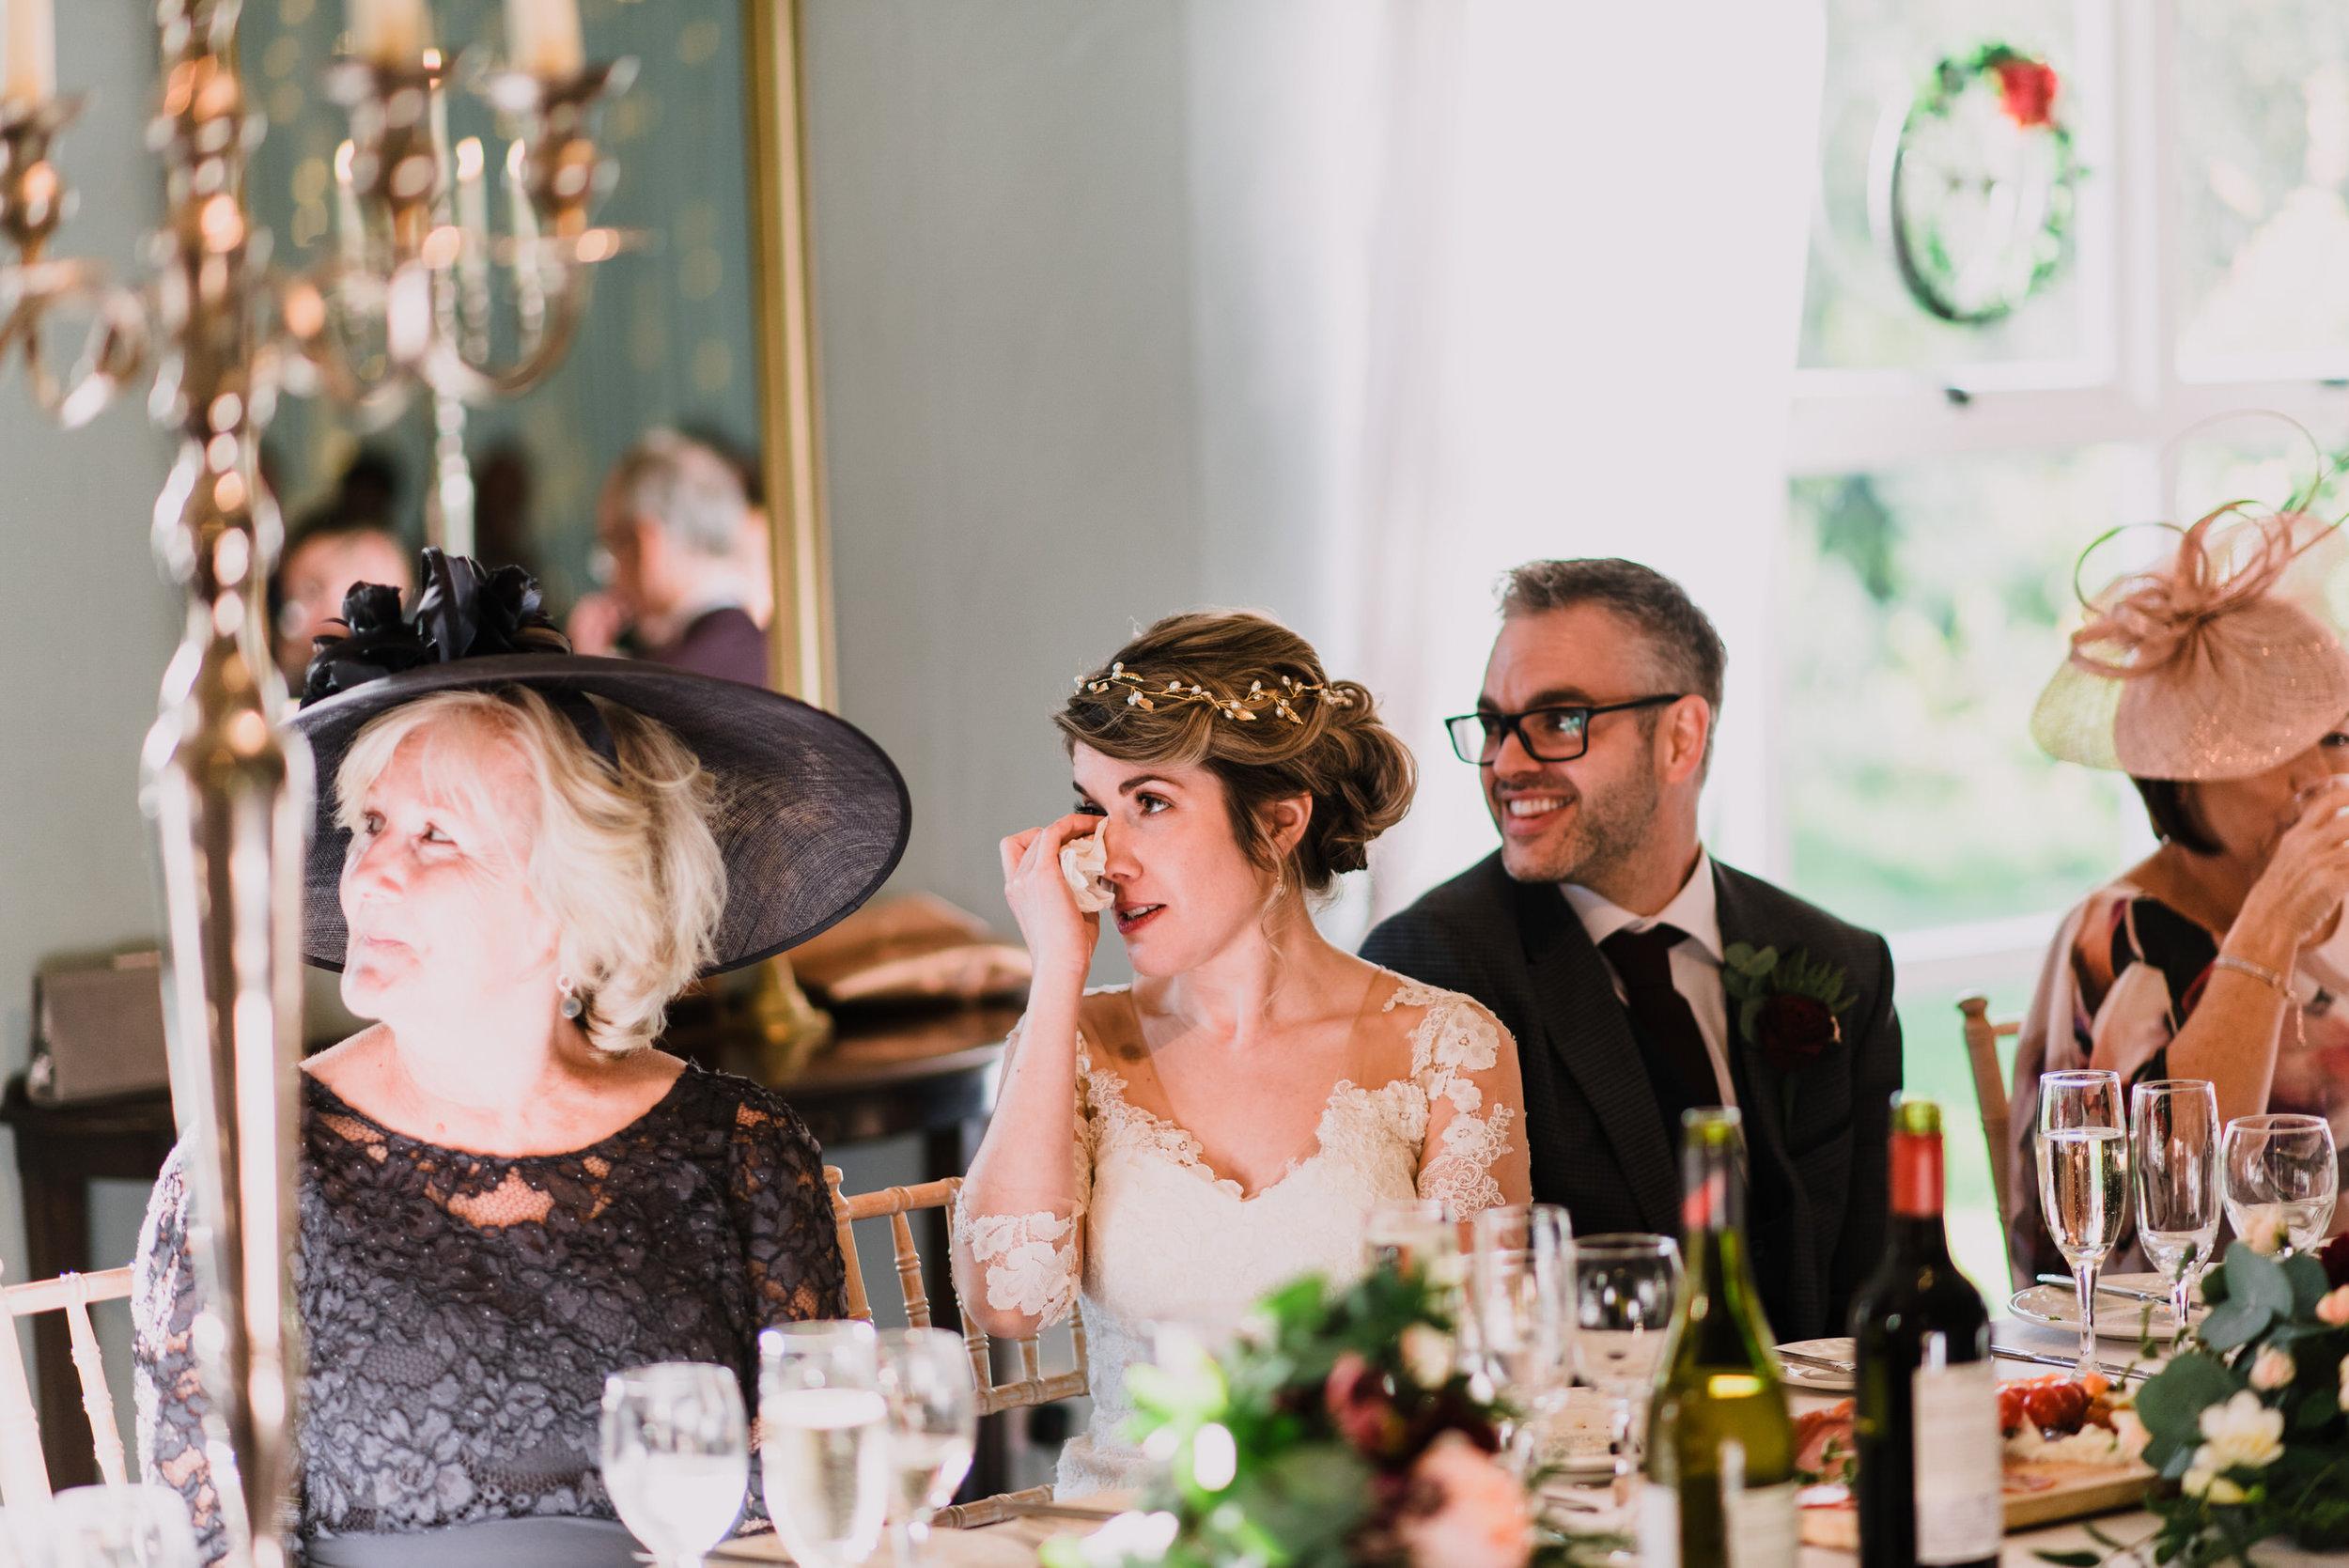 lissanoure castle wedding, northern ireland wedding photographer, romantic northern irish wedding venue, castle wedding ireland, natural wedding photography ni (110).jpg